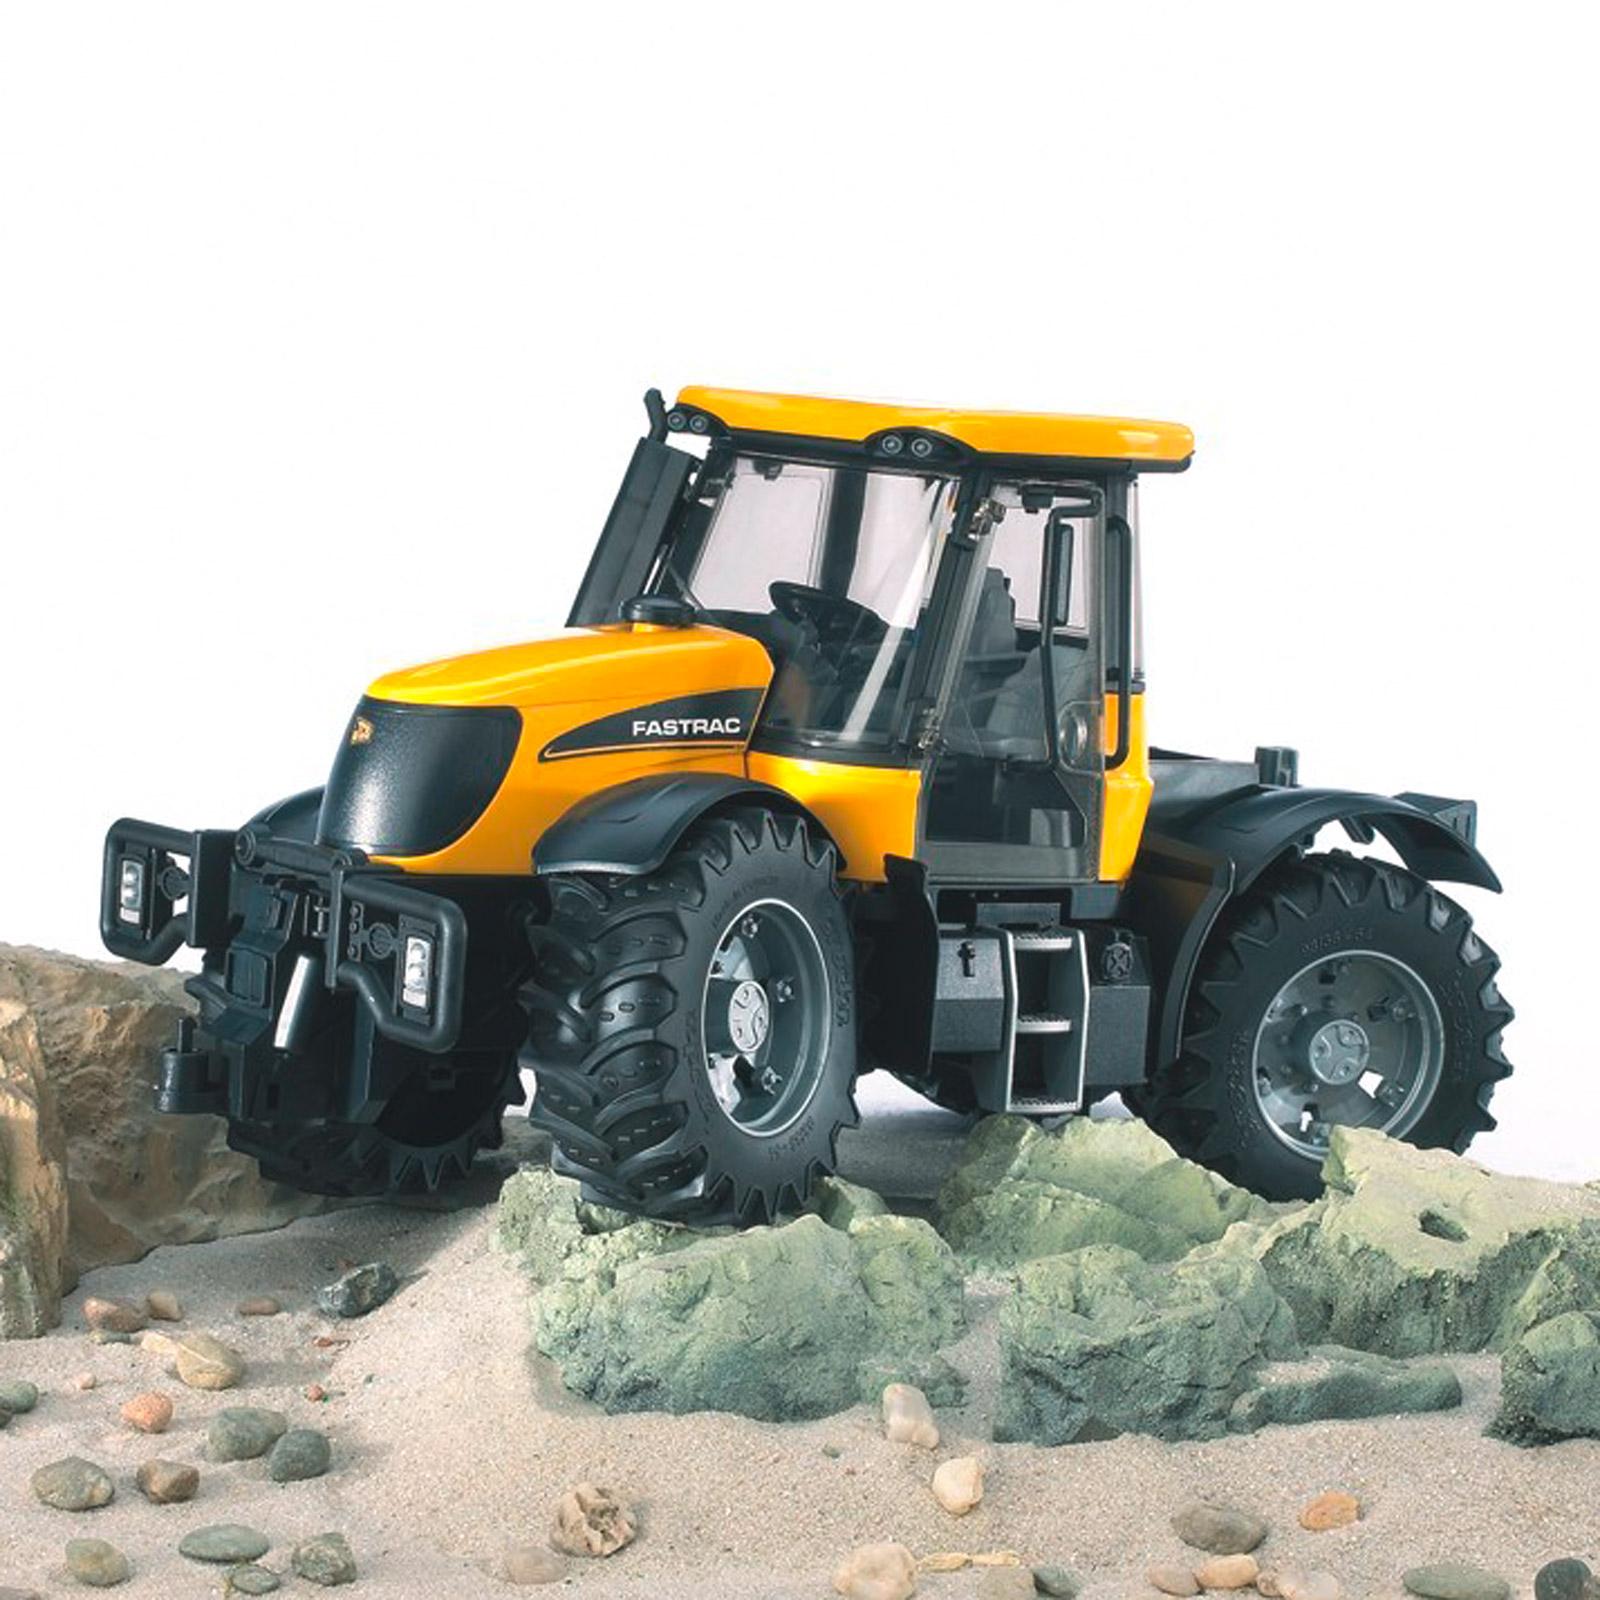 bruder 03030 traktor jcb fastrac 3220 neu 10345 ebay. Black Bedroom Furniture Sets. Home Design Ideas